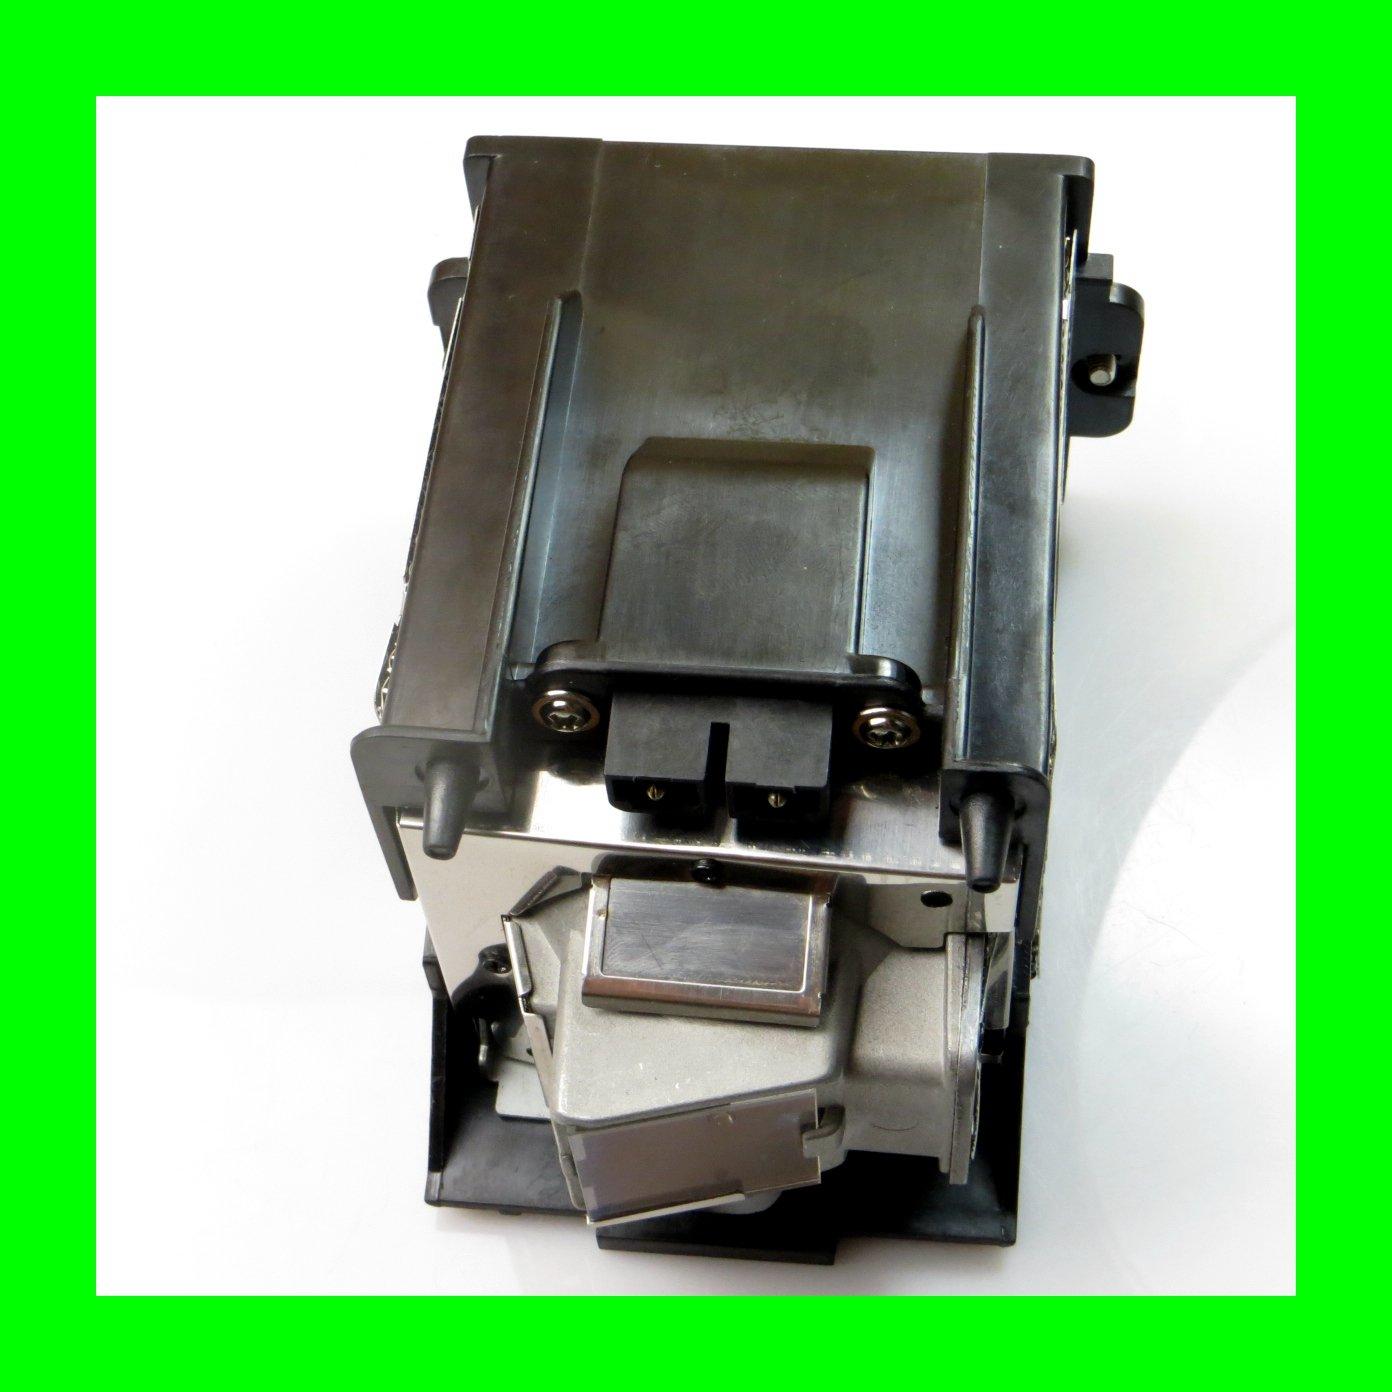 Nueva Original R9832747 R9832749 280 W E20.6 RLM-W6 Proyector Bare ...